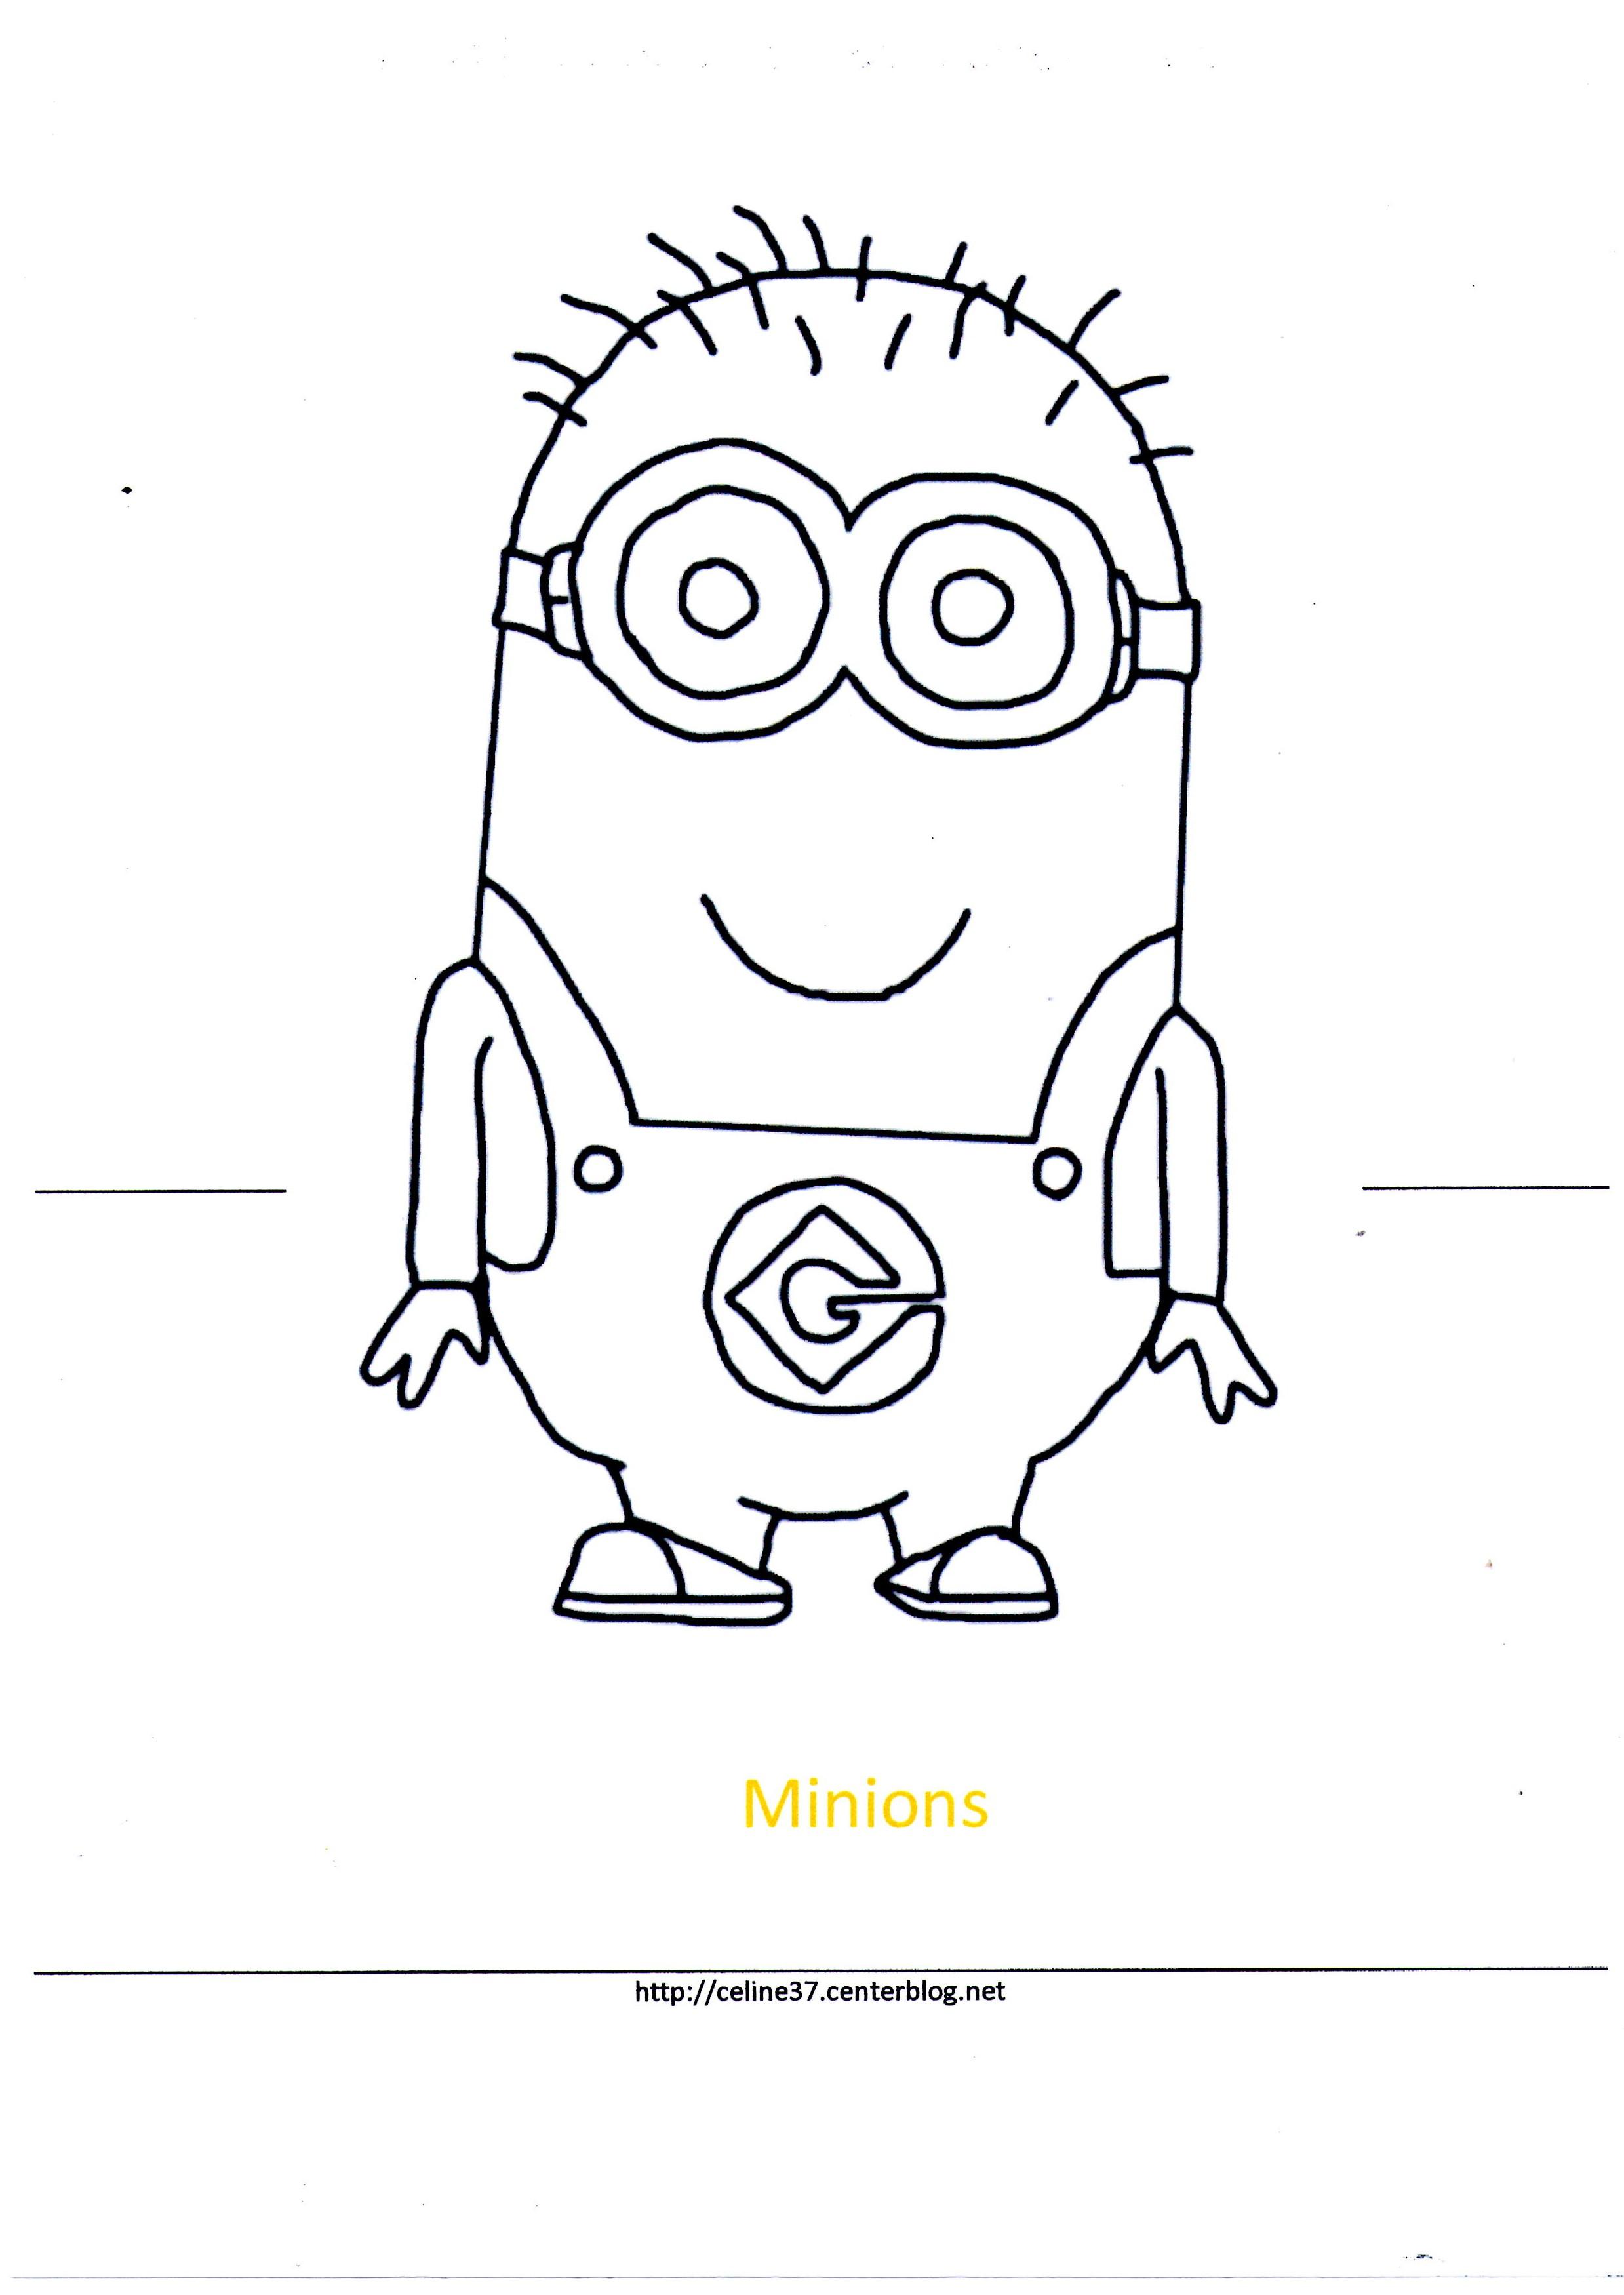 100 dibujos de Minions para colorear  Oh Kids  Page 2